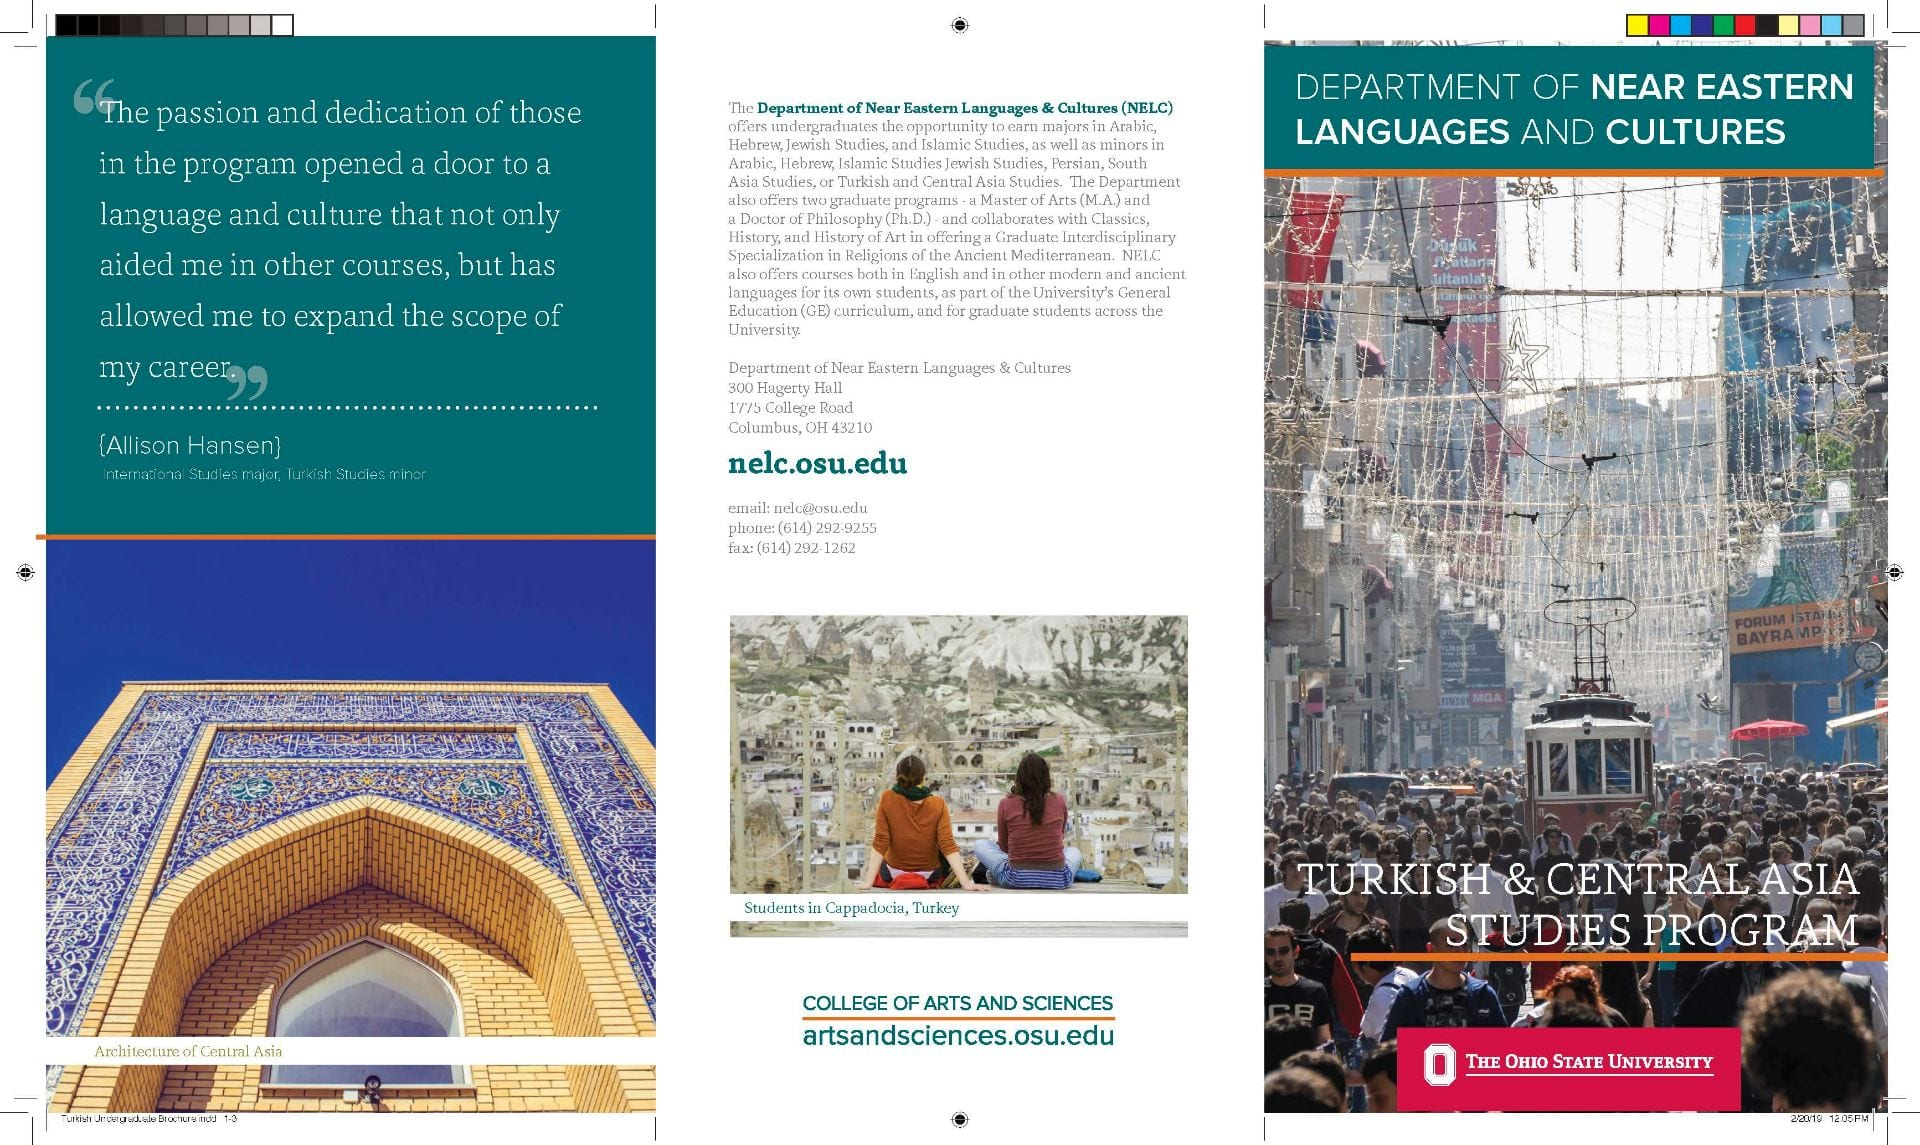 Turkish Undergraduate Brochure for NELC